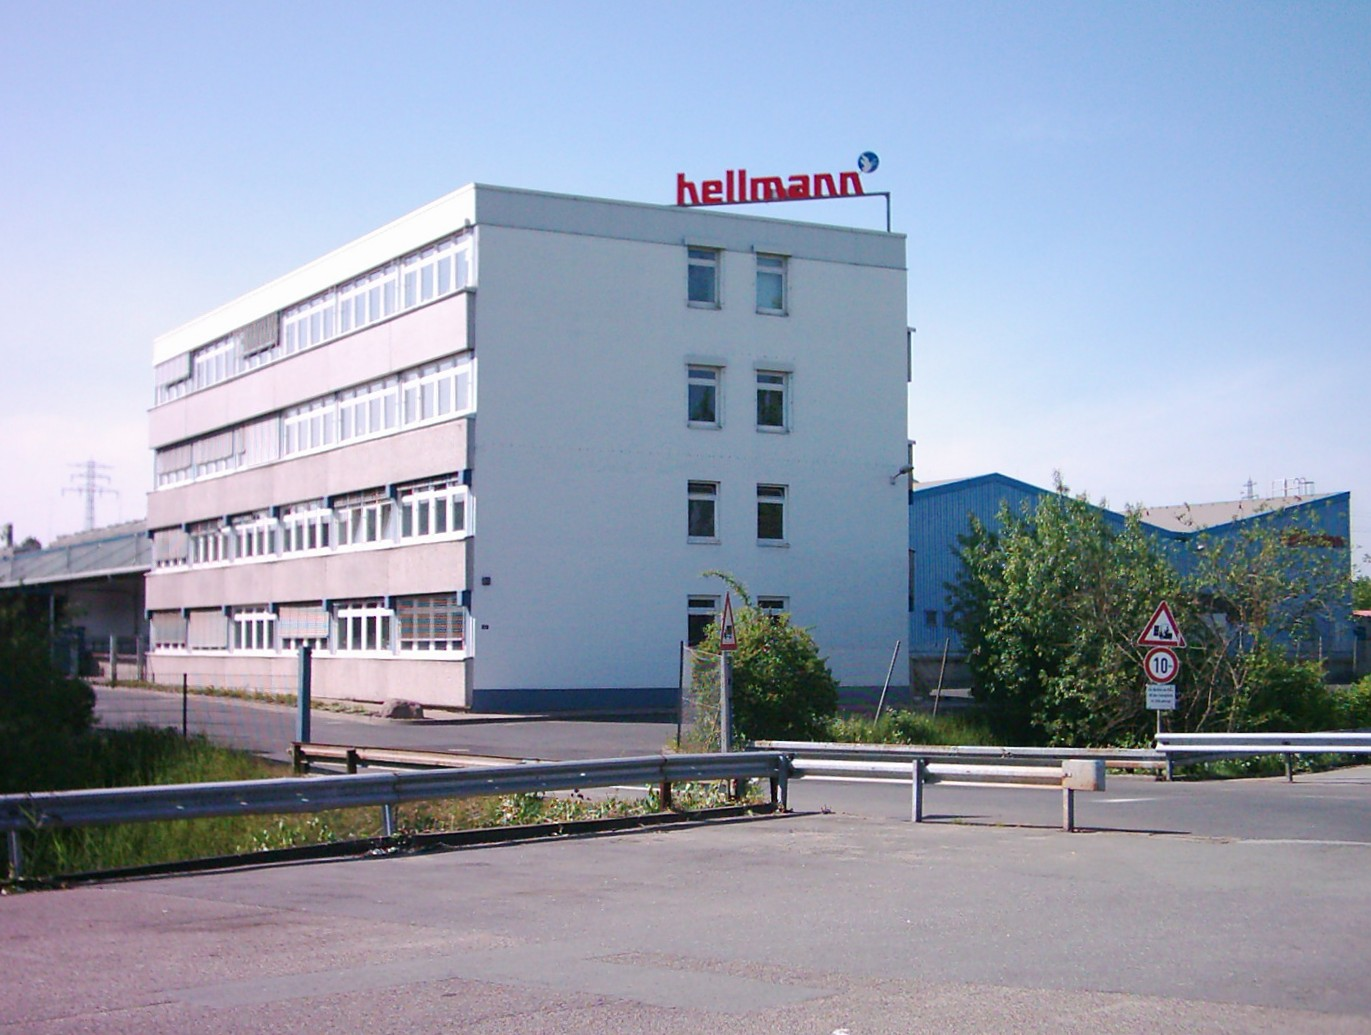 Hellmann Hamburg